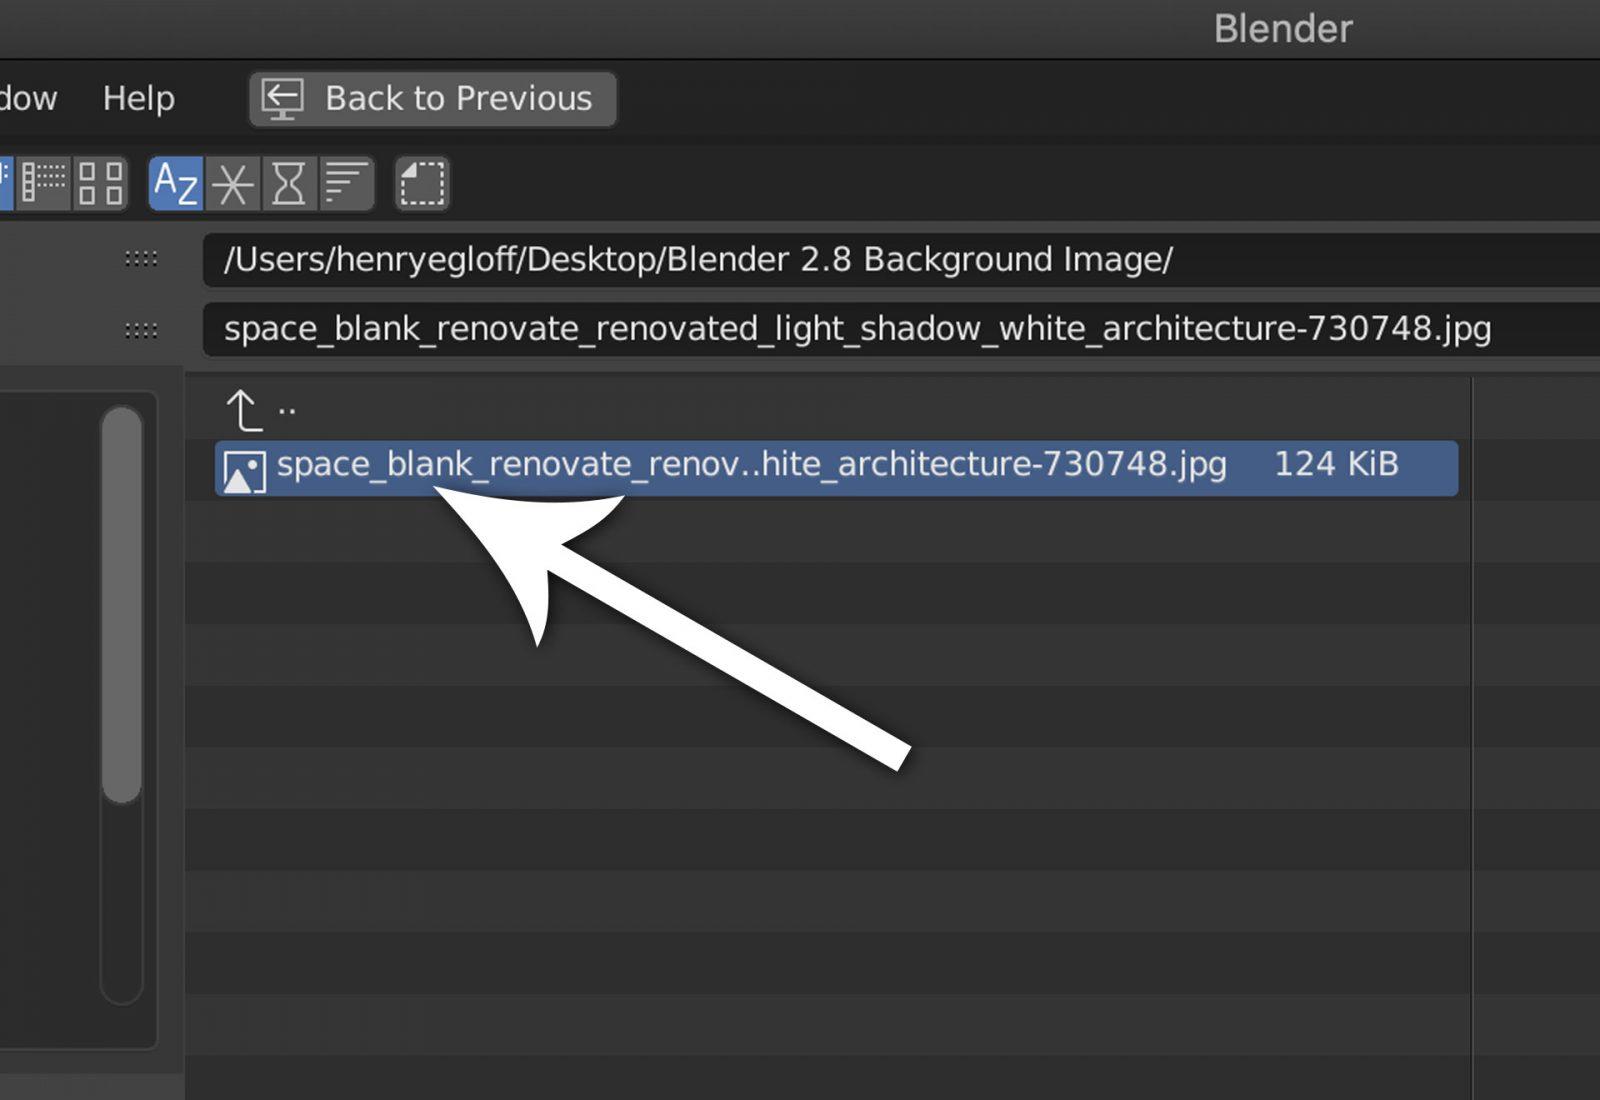 Render a Background Image Using Blender 2.8 - step 5 find and open background image